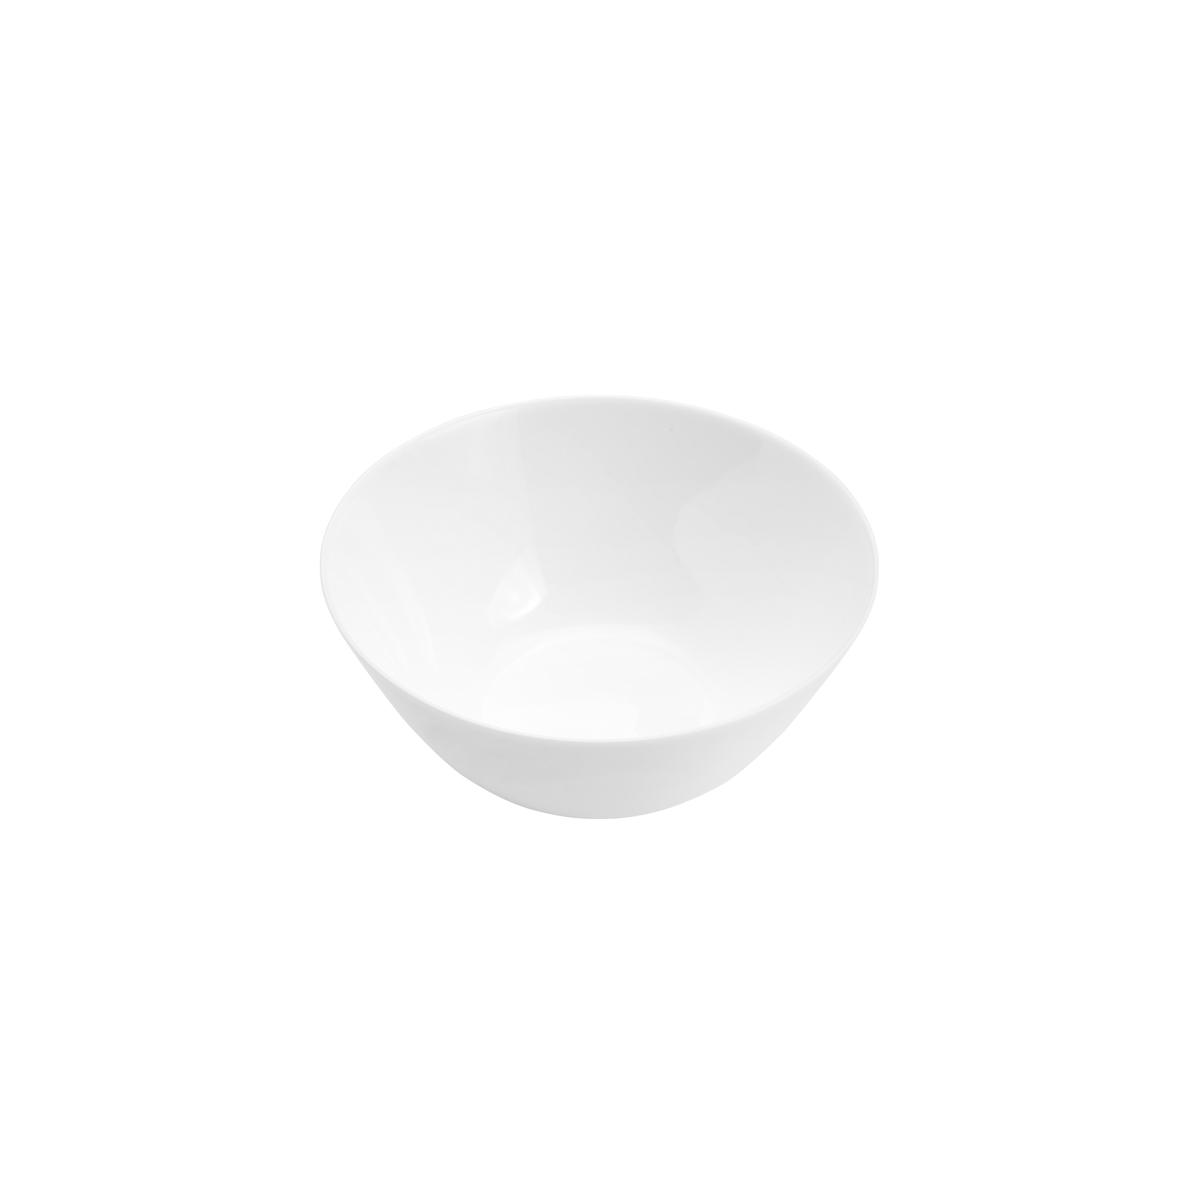 Bowl de vidro opalino Branco Zelie 18x7,5ml Lyor